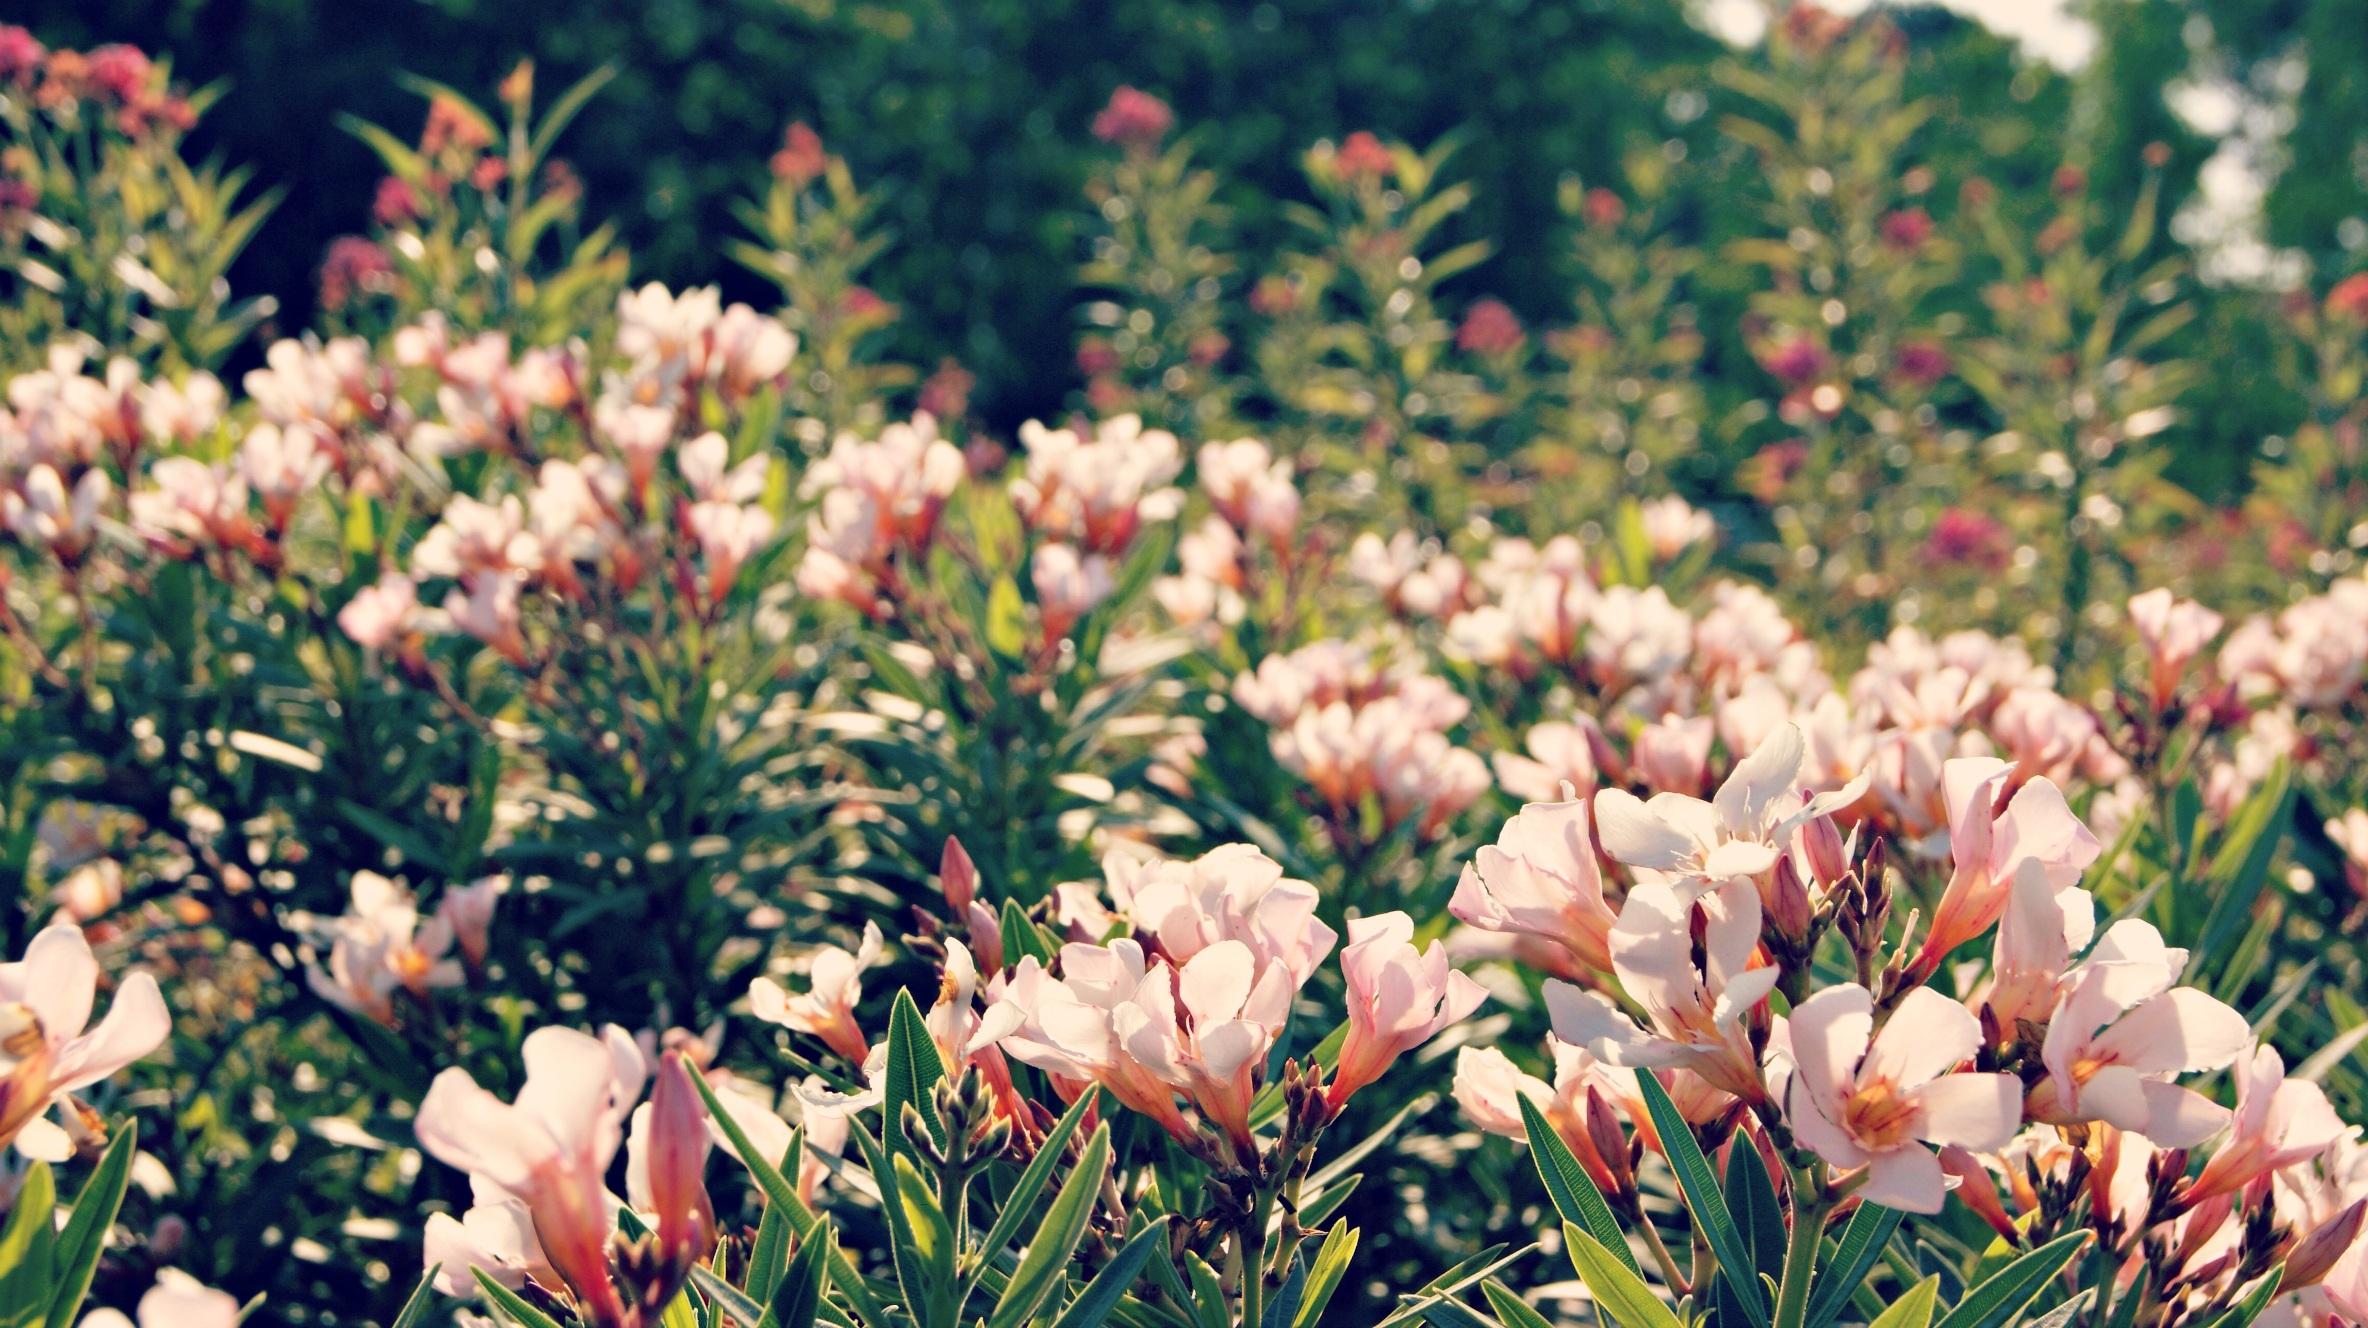 Free images nature grass blossom white lawn meadow petal free images nature grass blossom white lawn meadow petal bloom summer floral tulip spring botany garden pink flora season botanical mightylinksfo